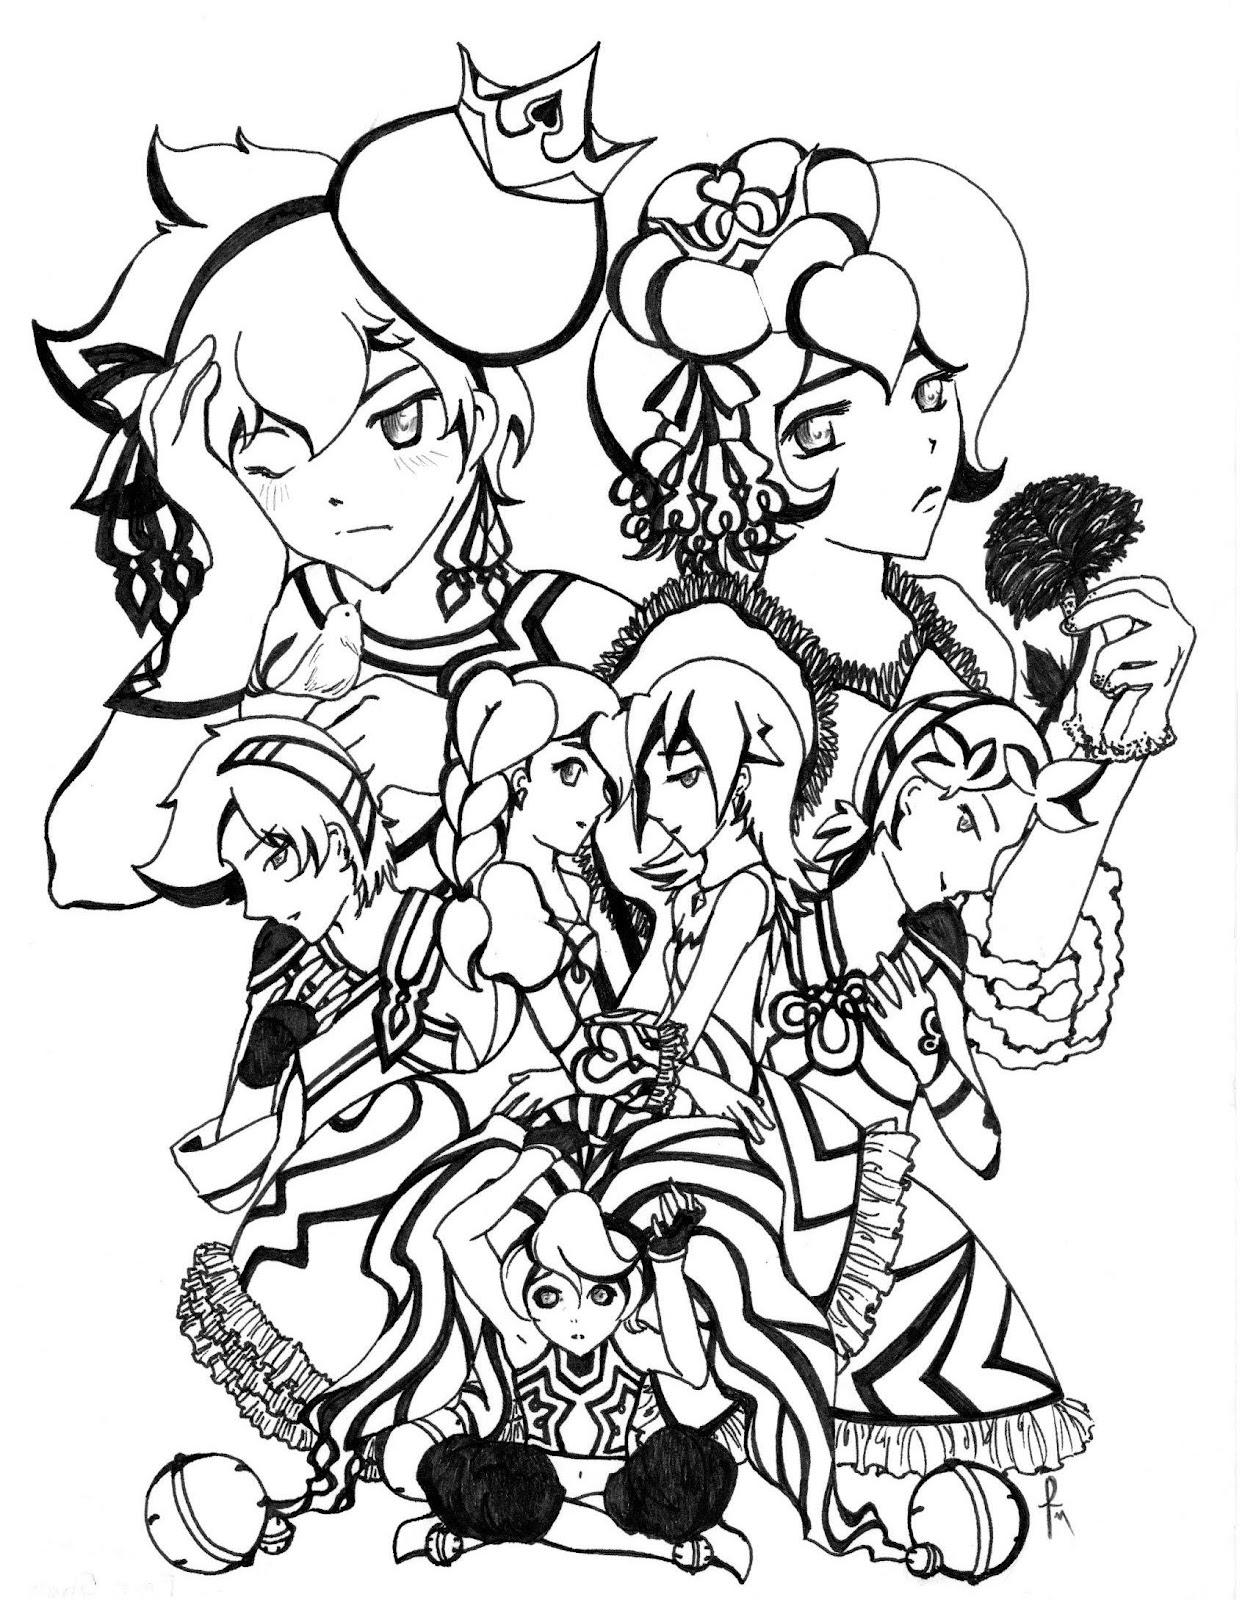 Art Contest '09